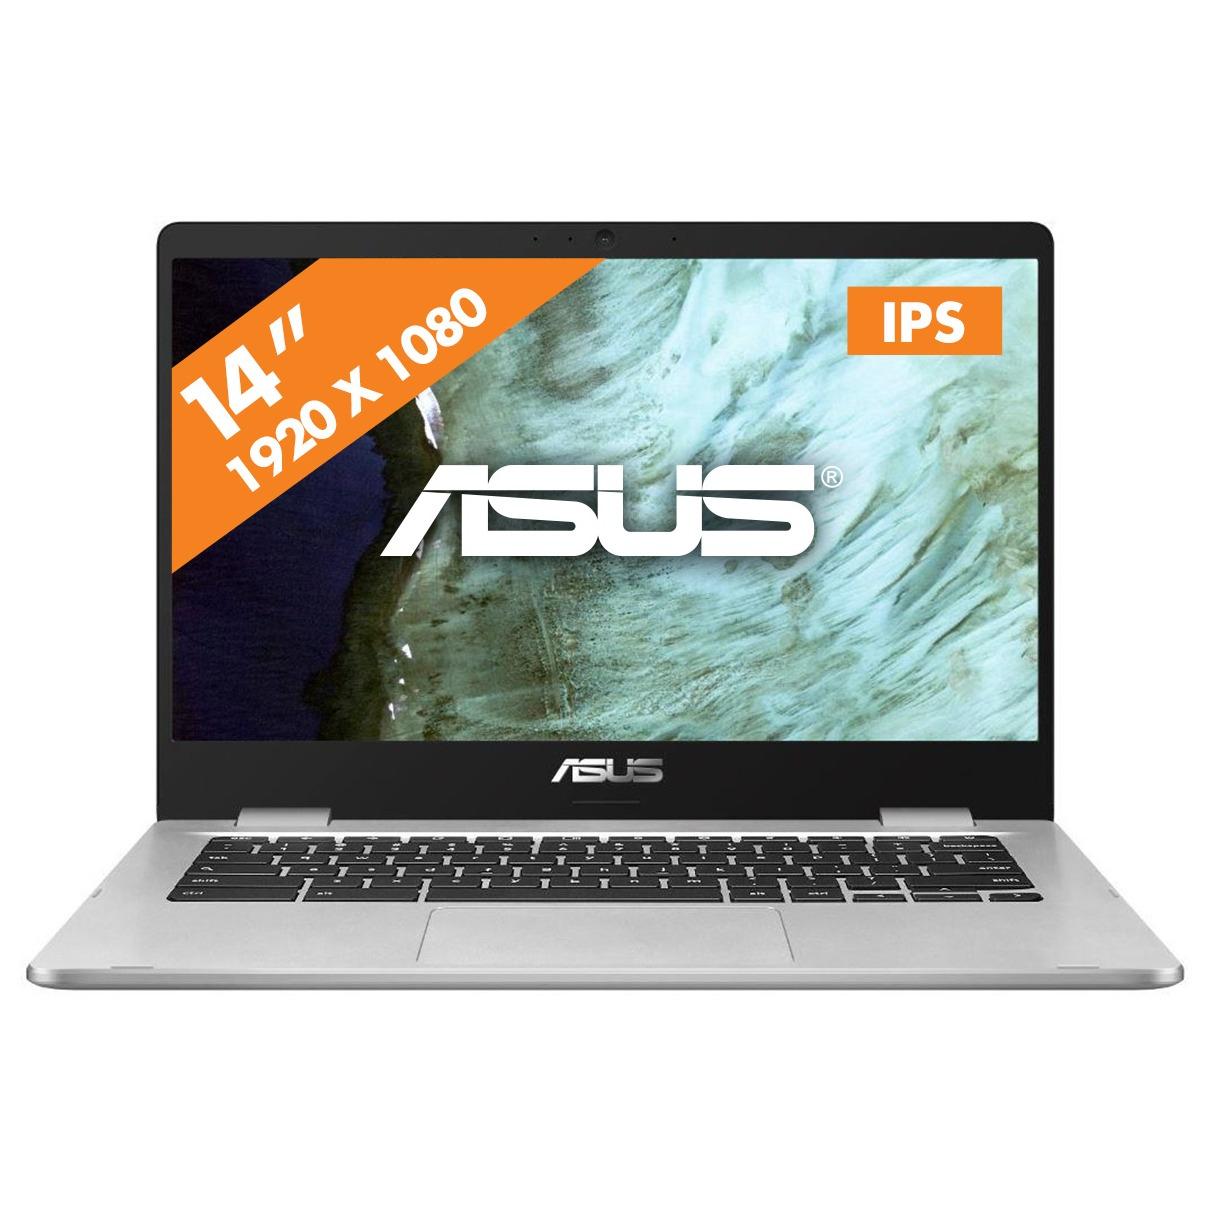 Asus chromebook C423NA EB0050 zilver